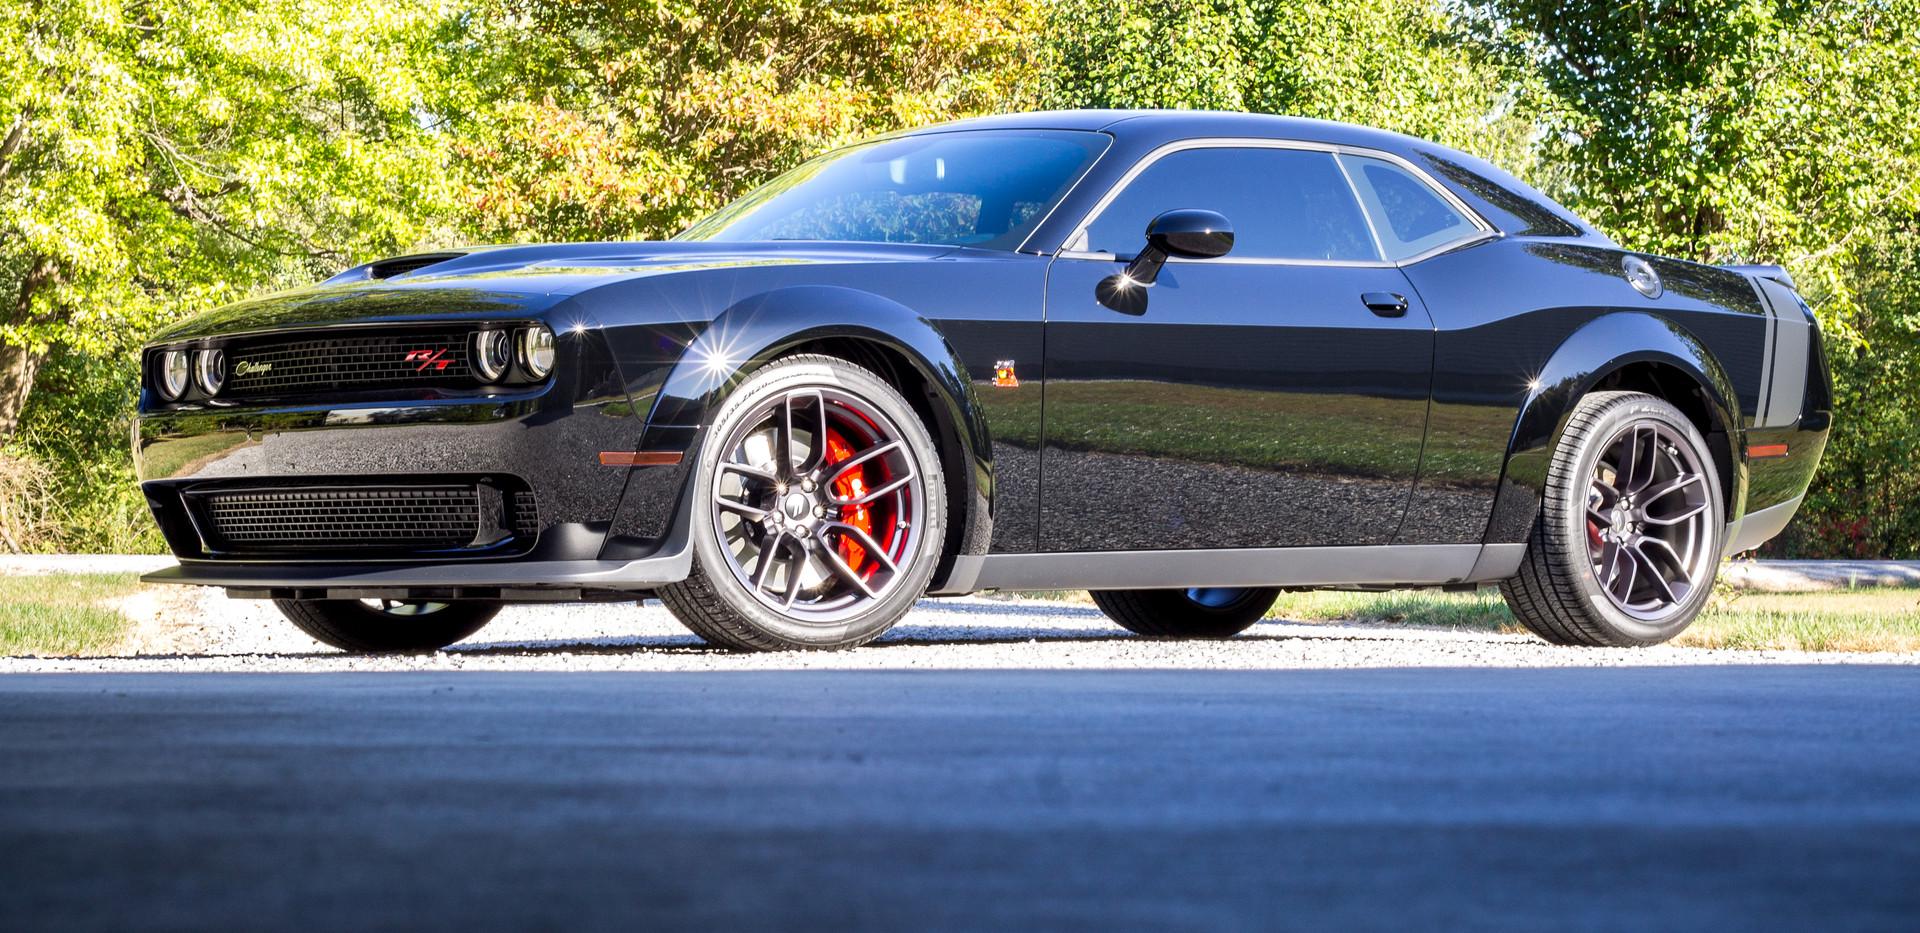 2019 Dodge Challenger.jpg